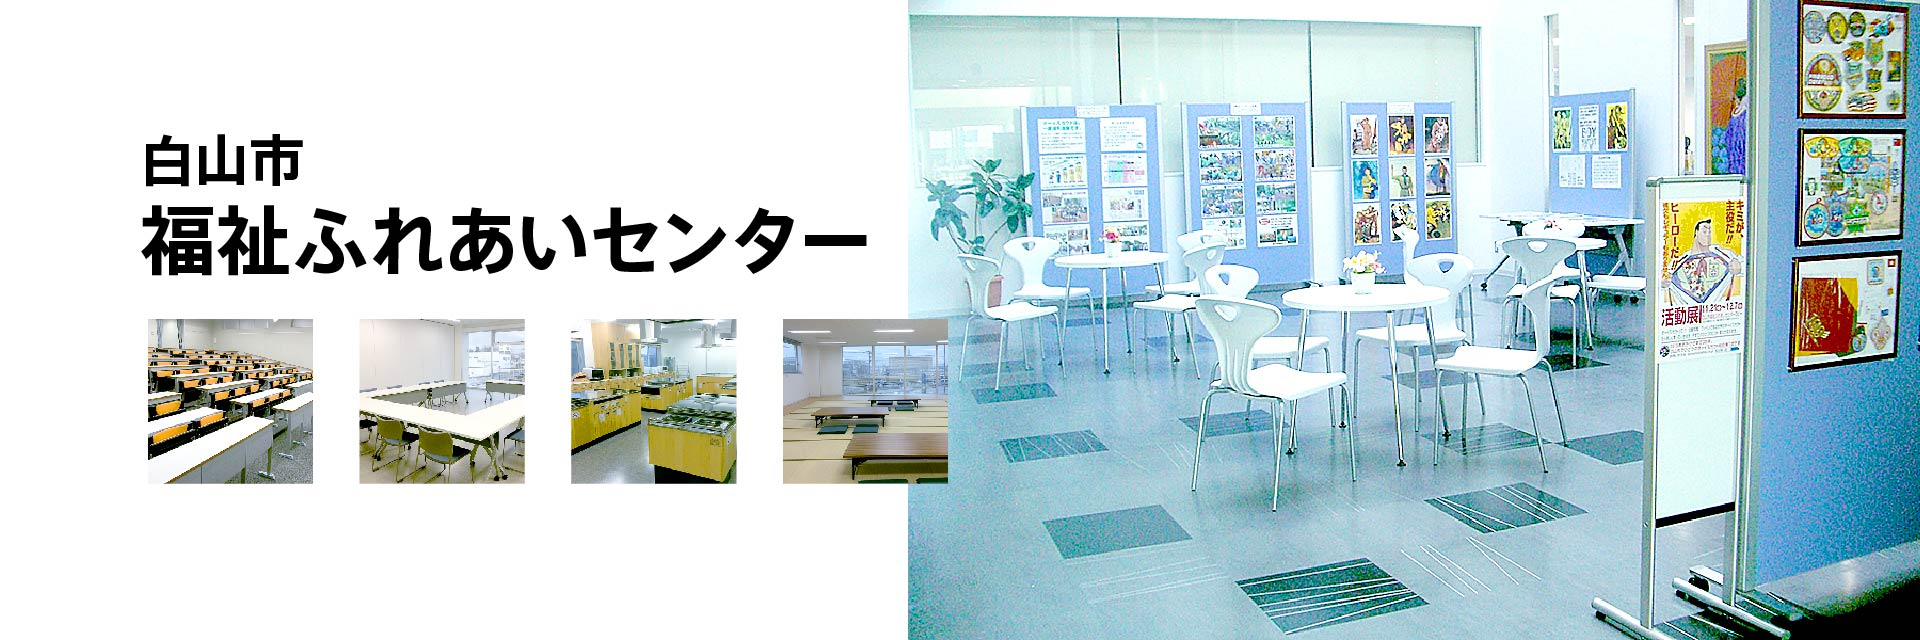 http://hakusanshi-syakyo.jp/wp-content/uploads/2019/05/topimg_fureai.jpg白山市福祉ふれあいセンター